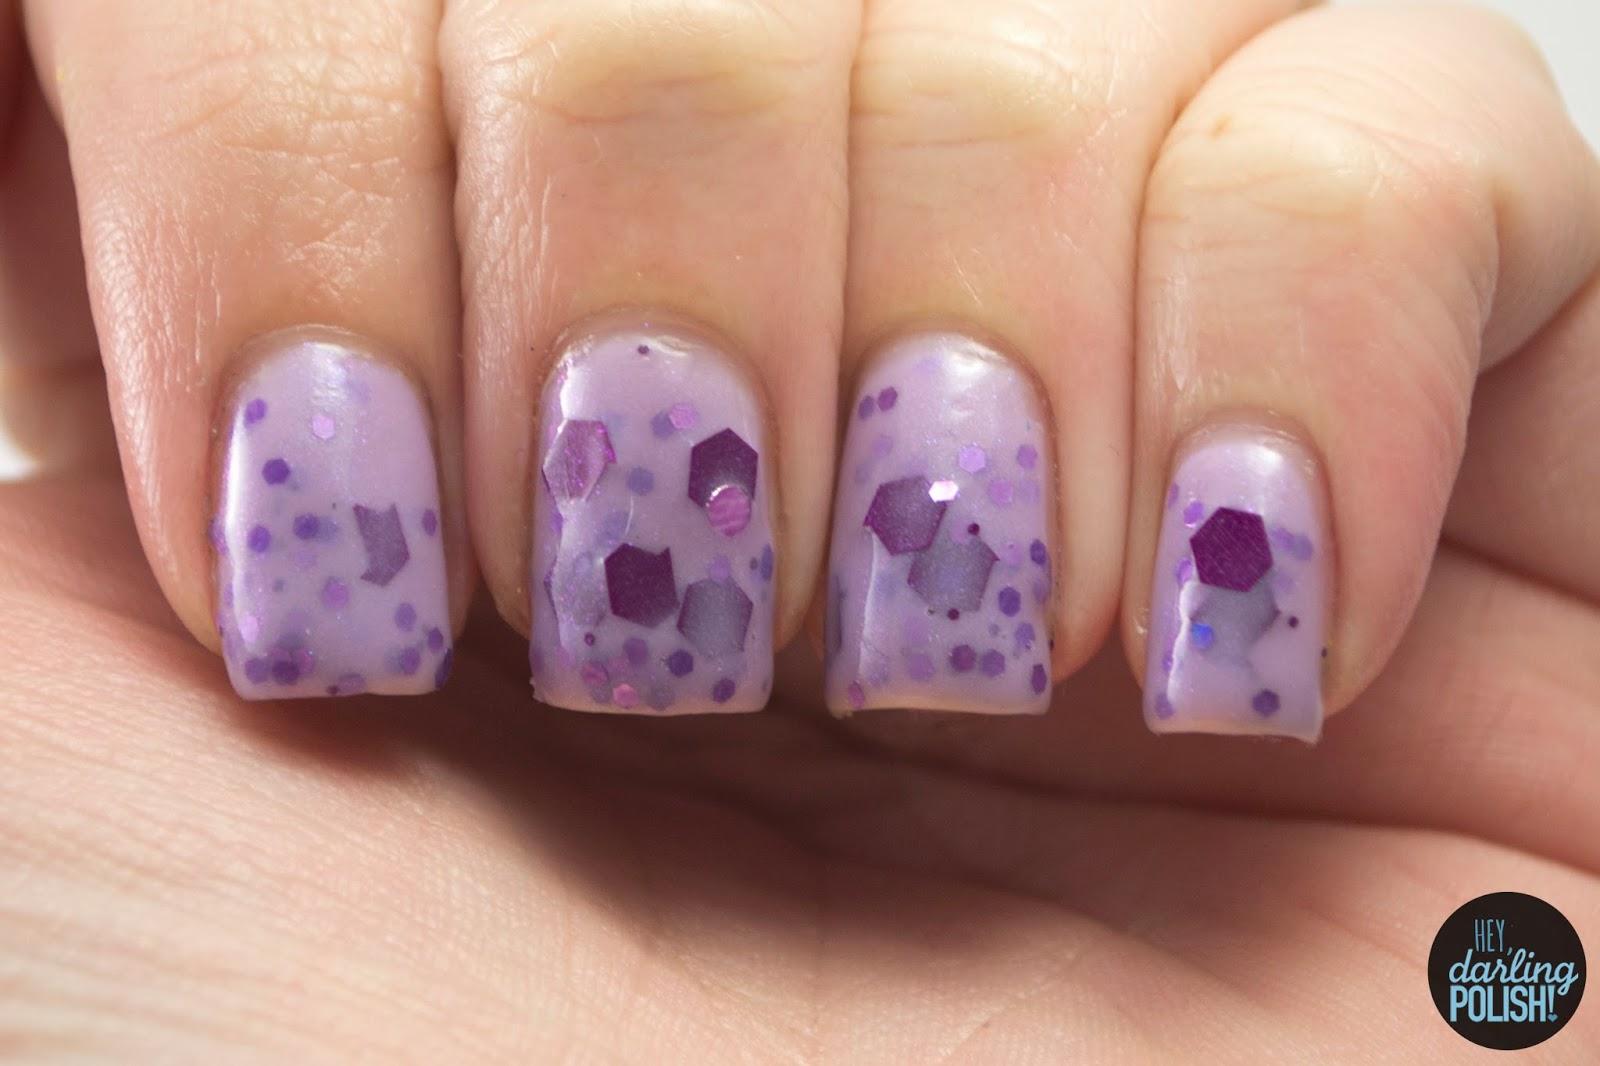 glitter, nails, nail polish, polish, indie, indie nail polish, indie polish, hey darling polish, squishy face polish, bed peace, purple